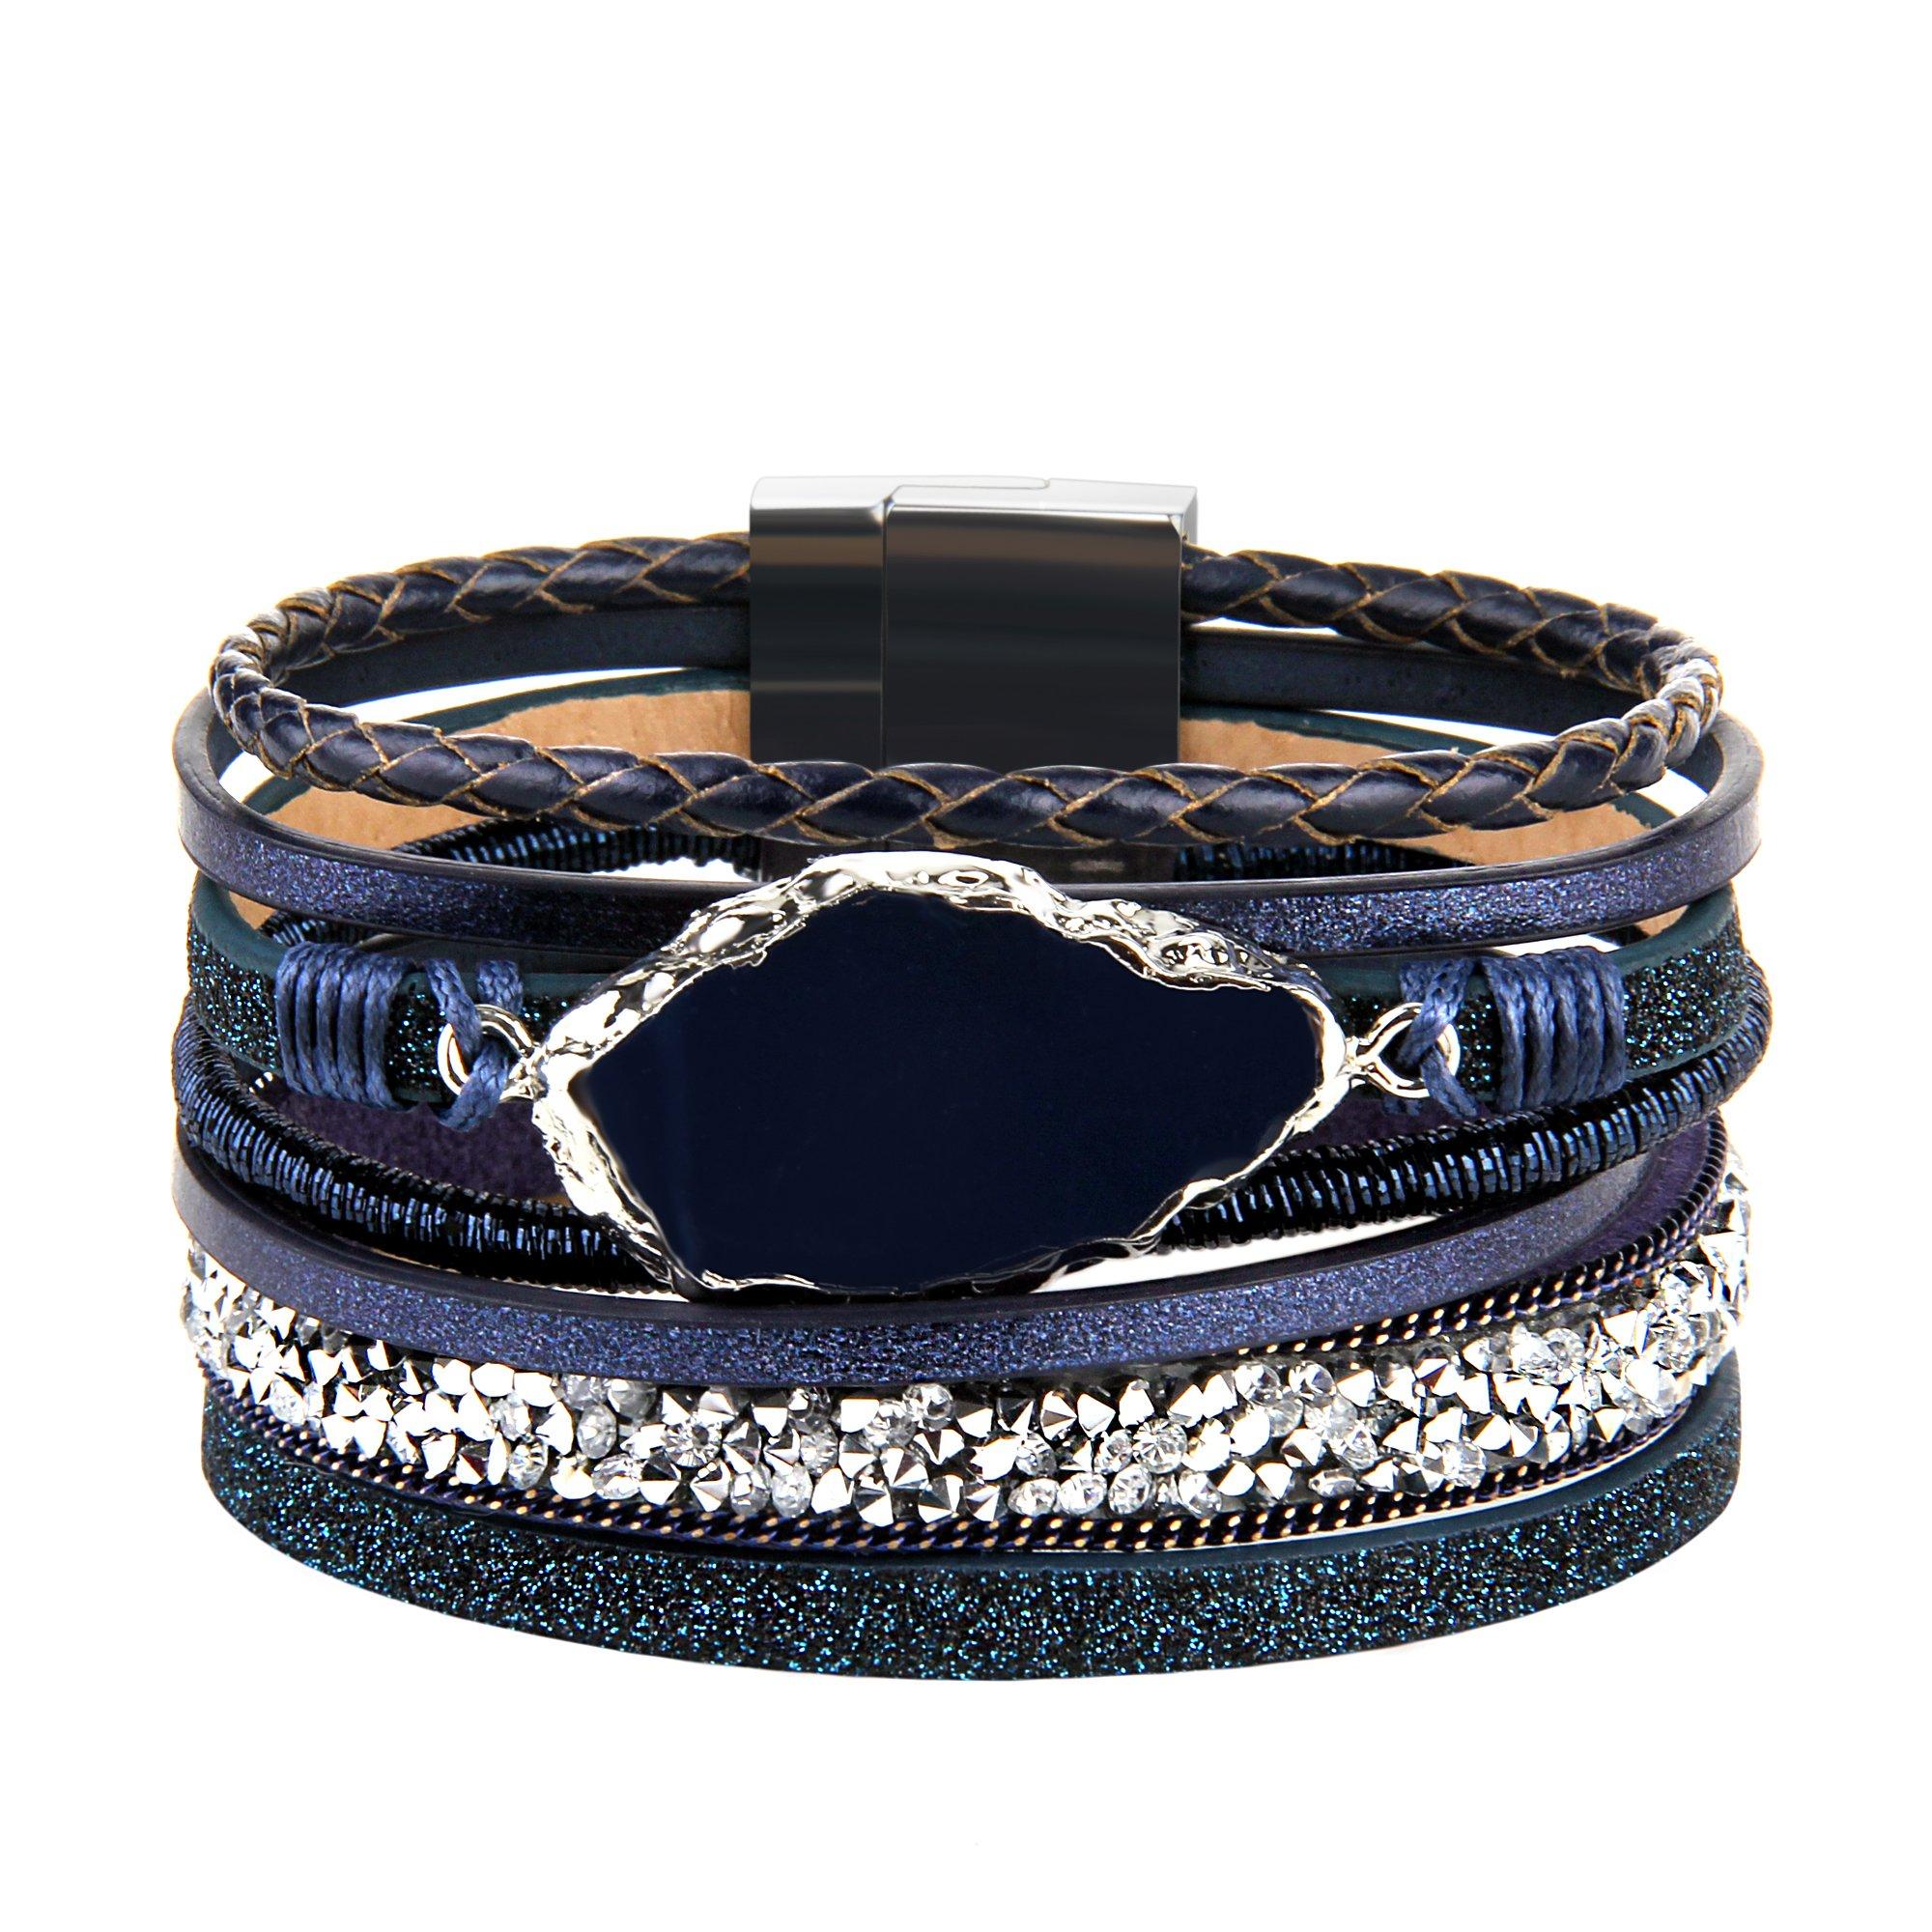 Leather Wrap Bracelet – Handmade Braided Cuff Bangle – Agate Stone Crystal Jewelry – for Women,Girl Gift By JAOYU